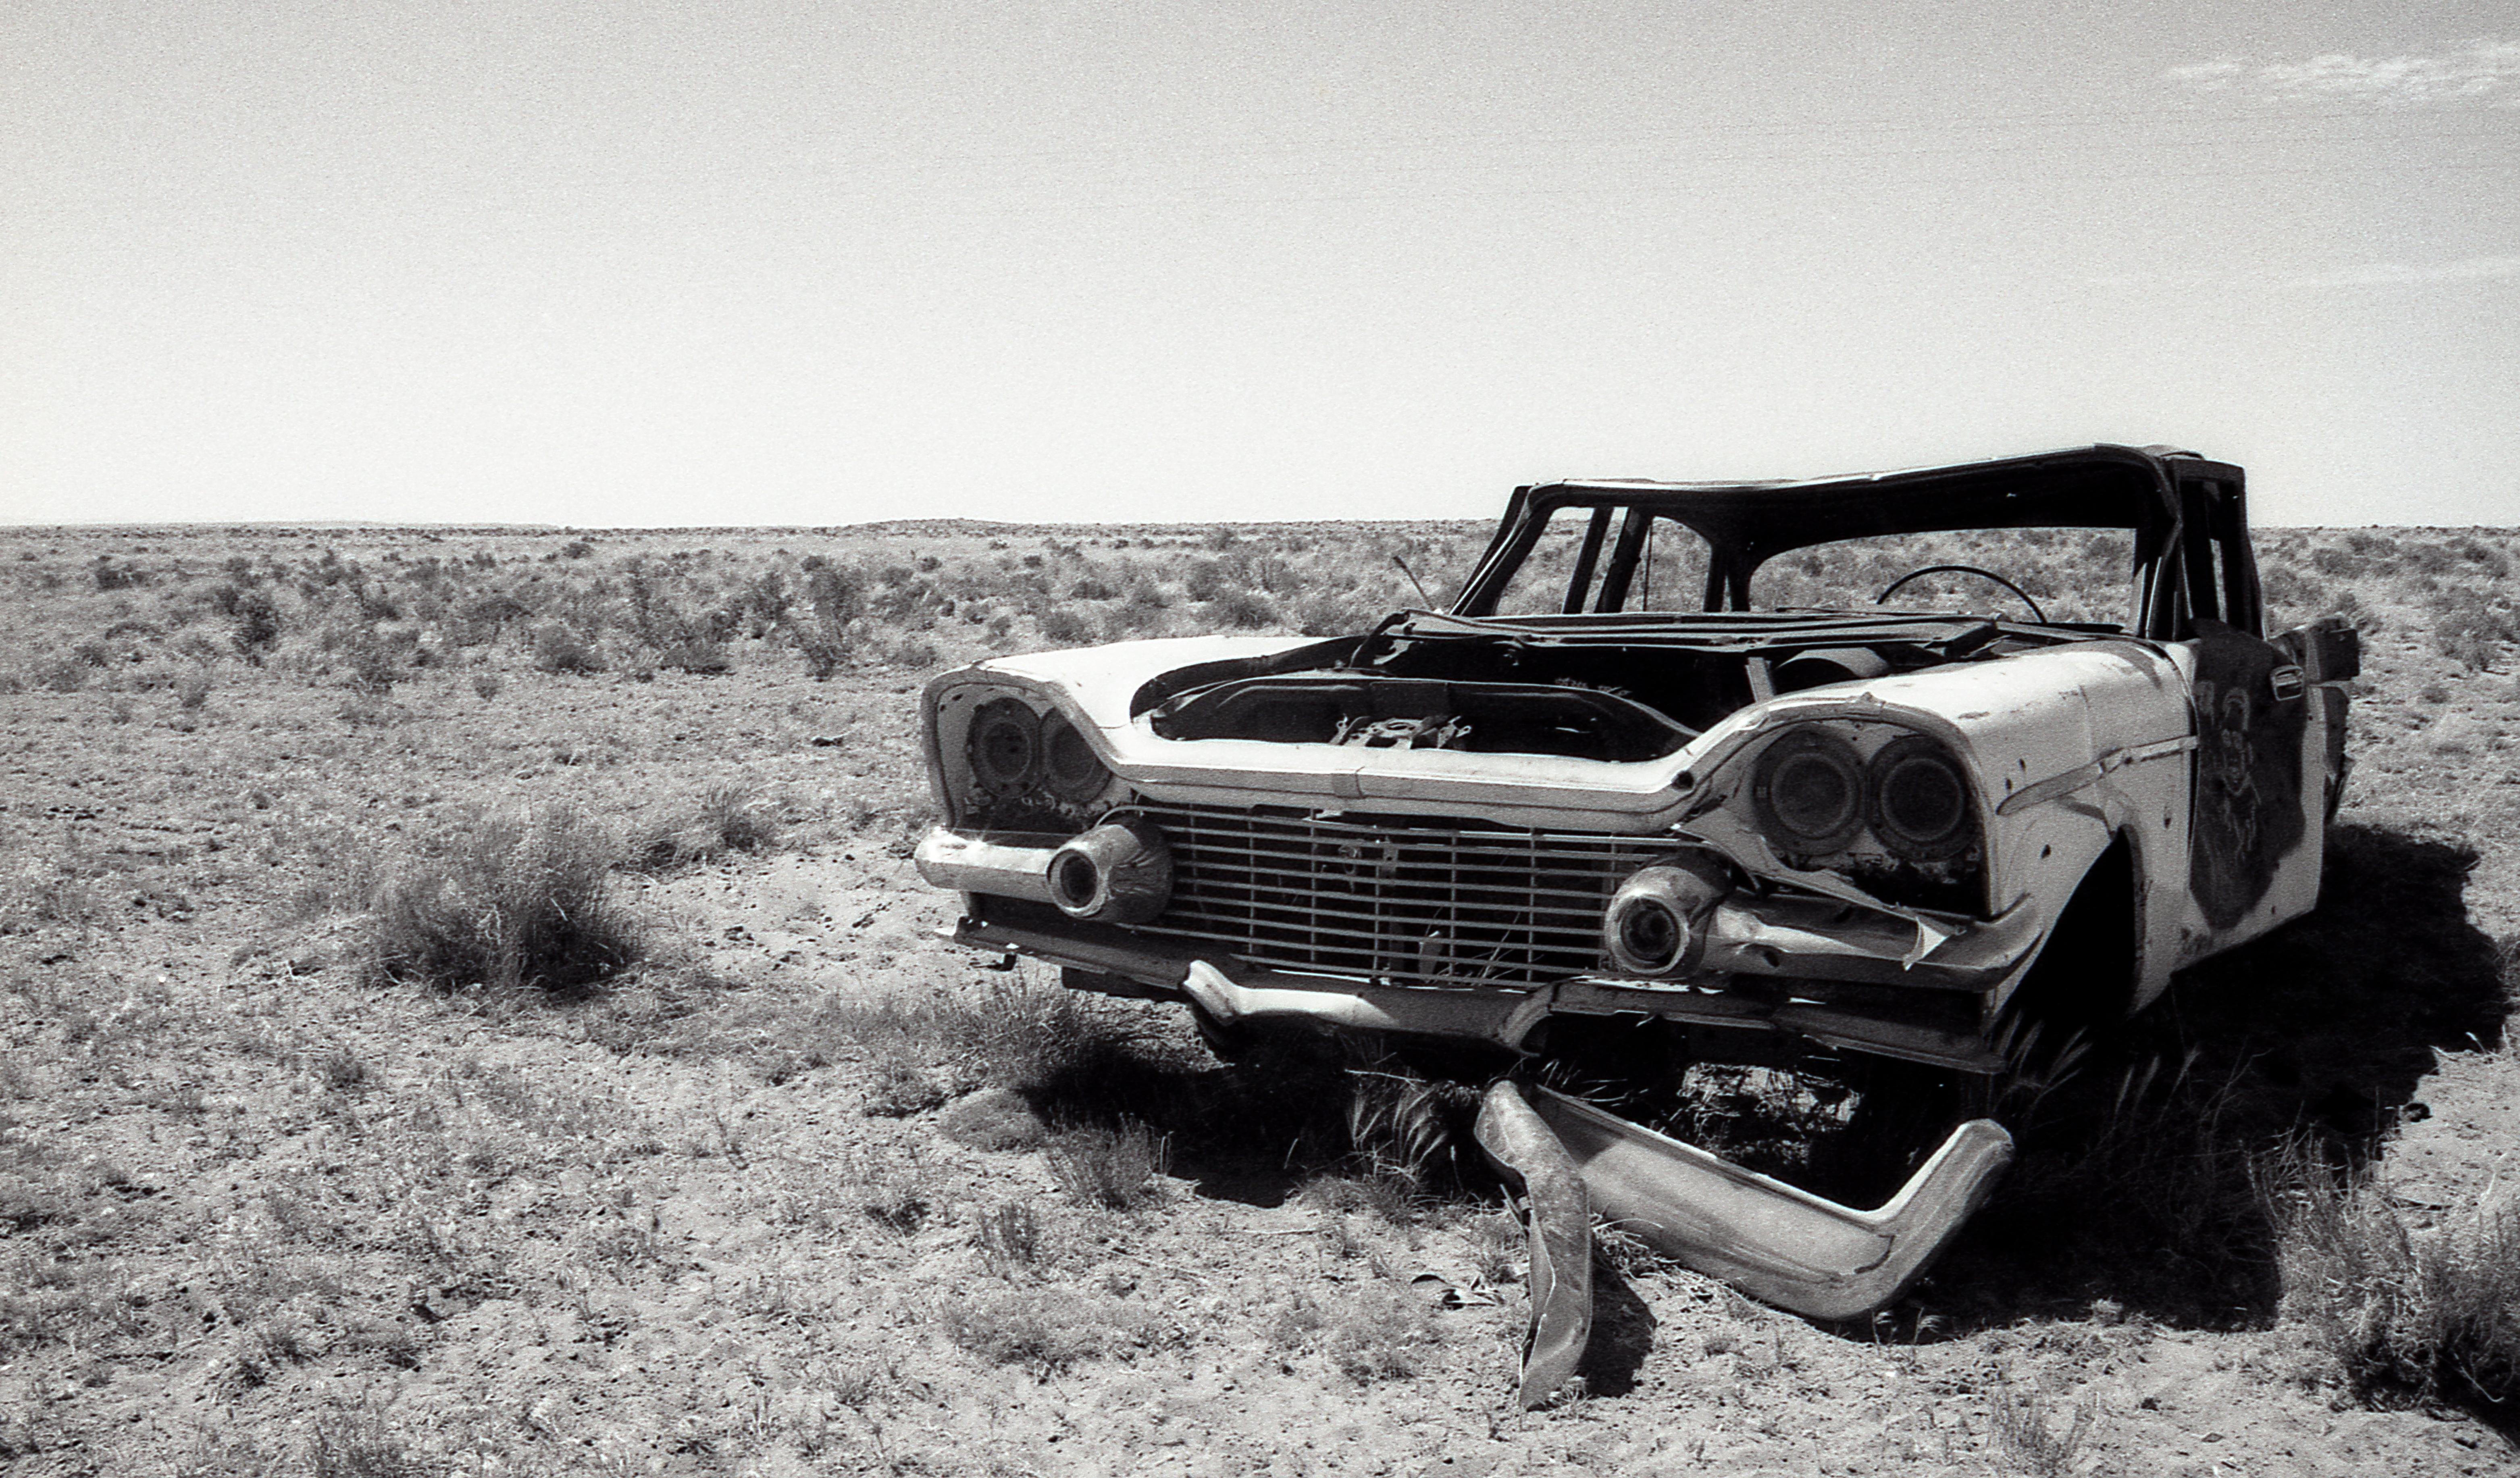 Dead Car 1